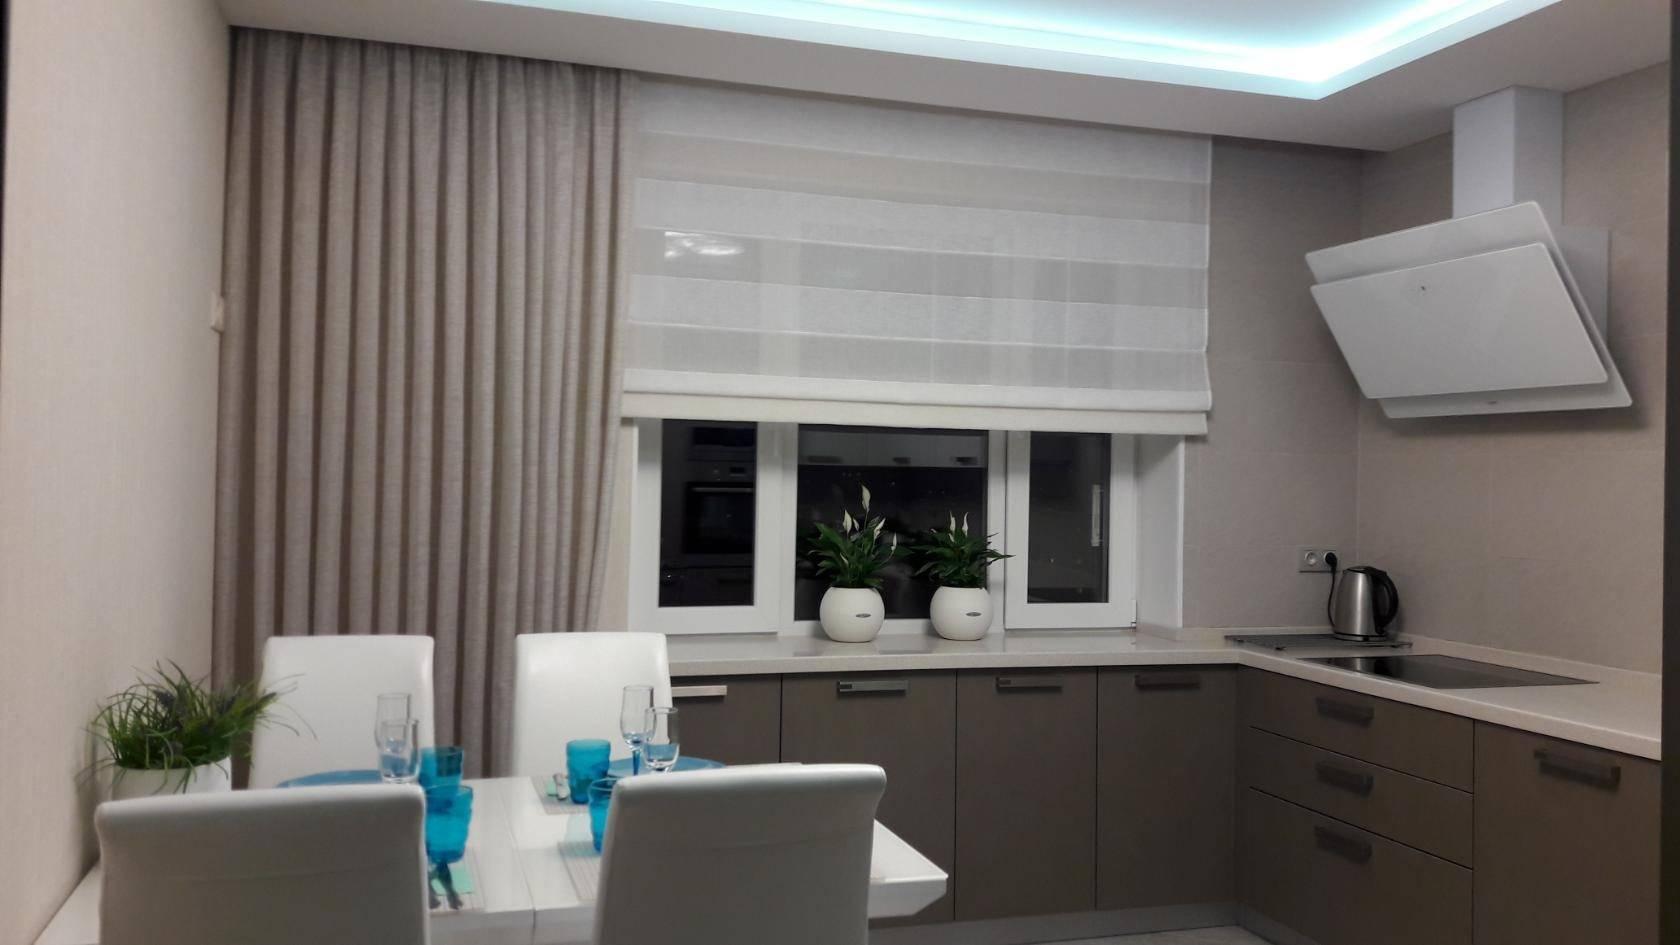 Дизайн кухни в стиле минимализм - 52 фото в интерьере